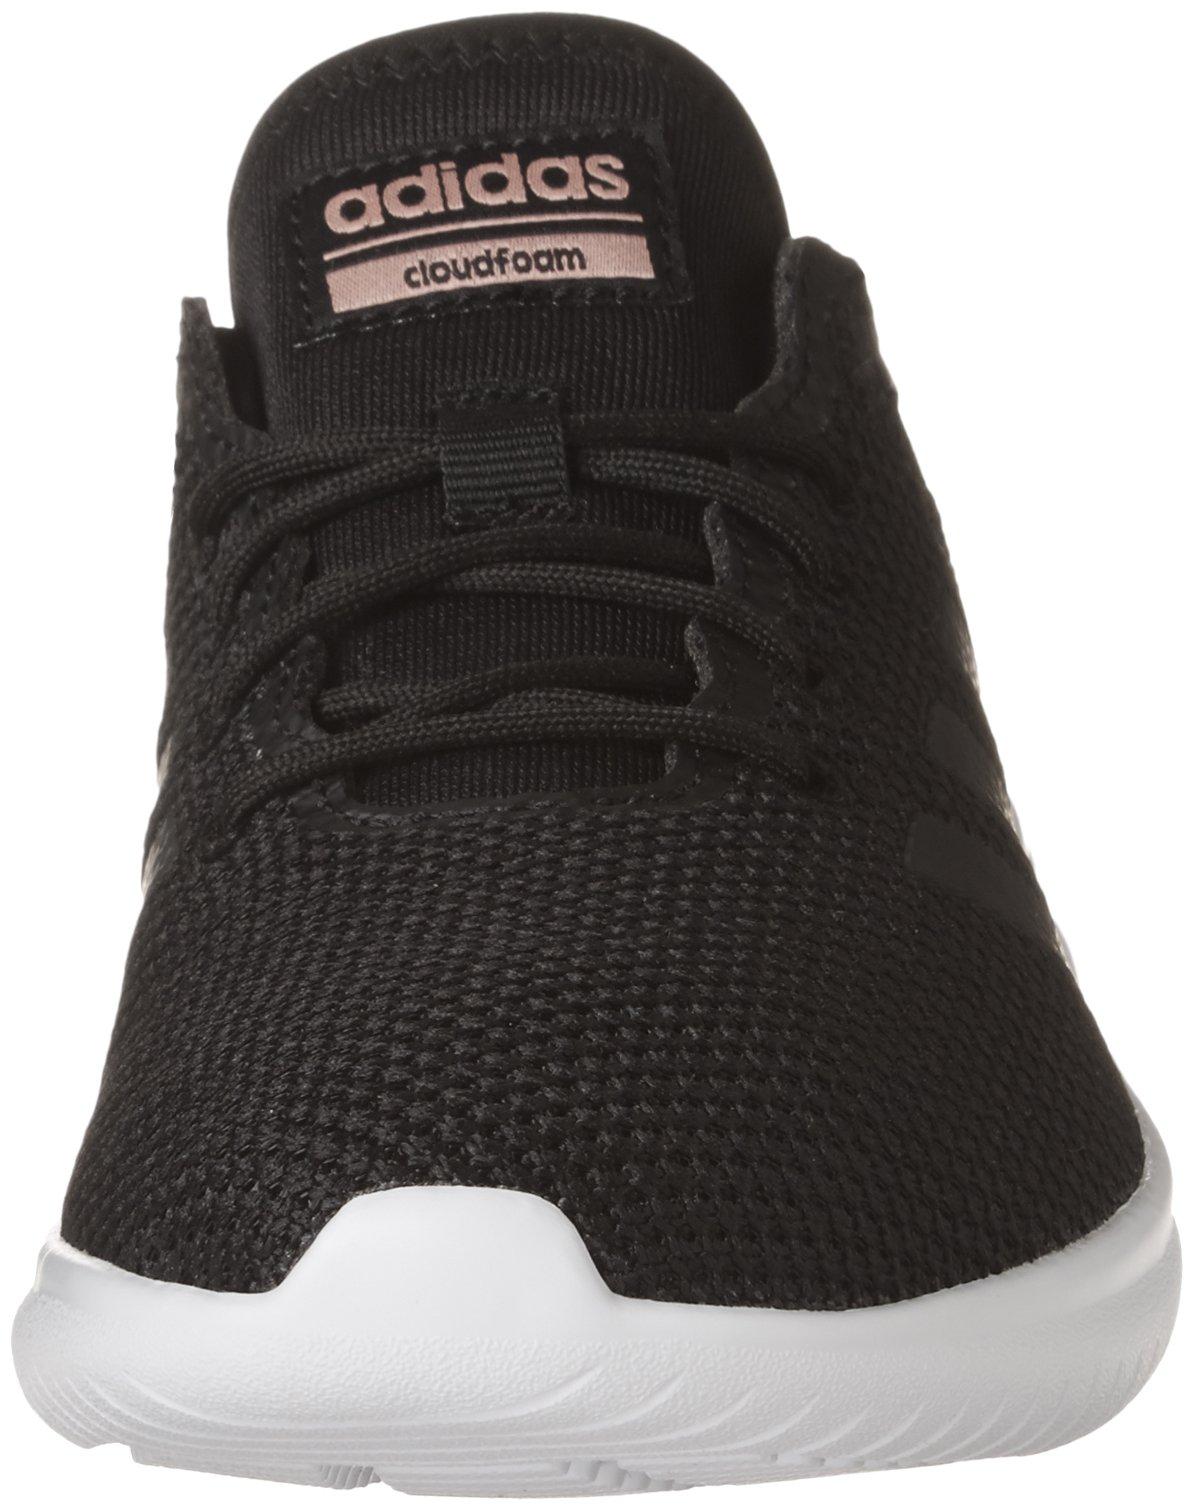 Adidas donne cloudfoam qt flex scarpe da ginnastica, nero / nero / traccia rosa, 8